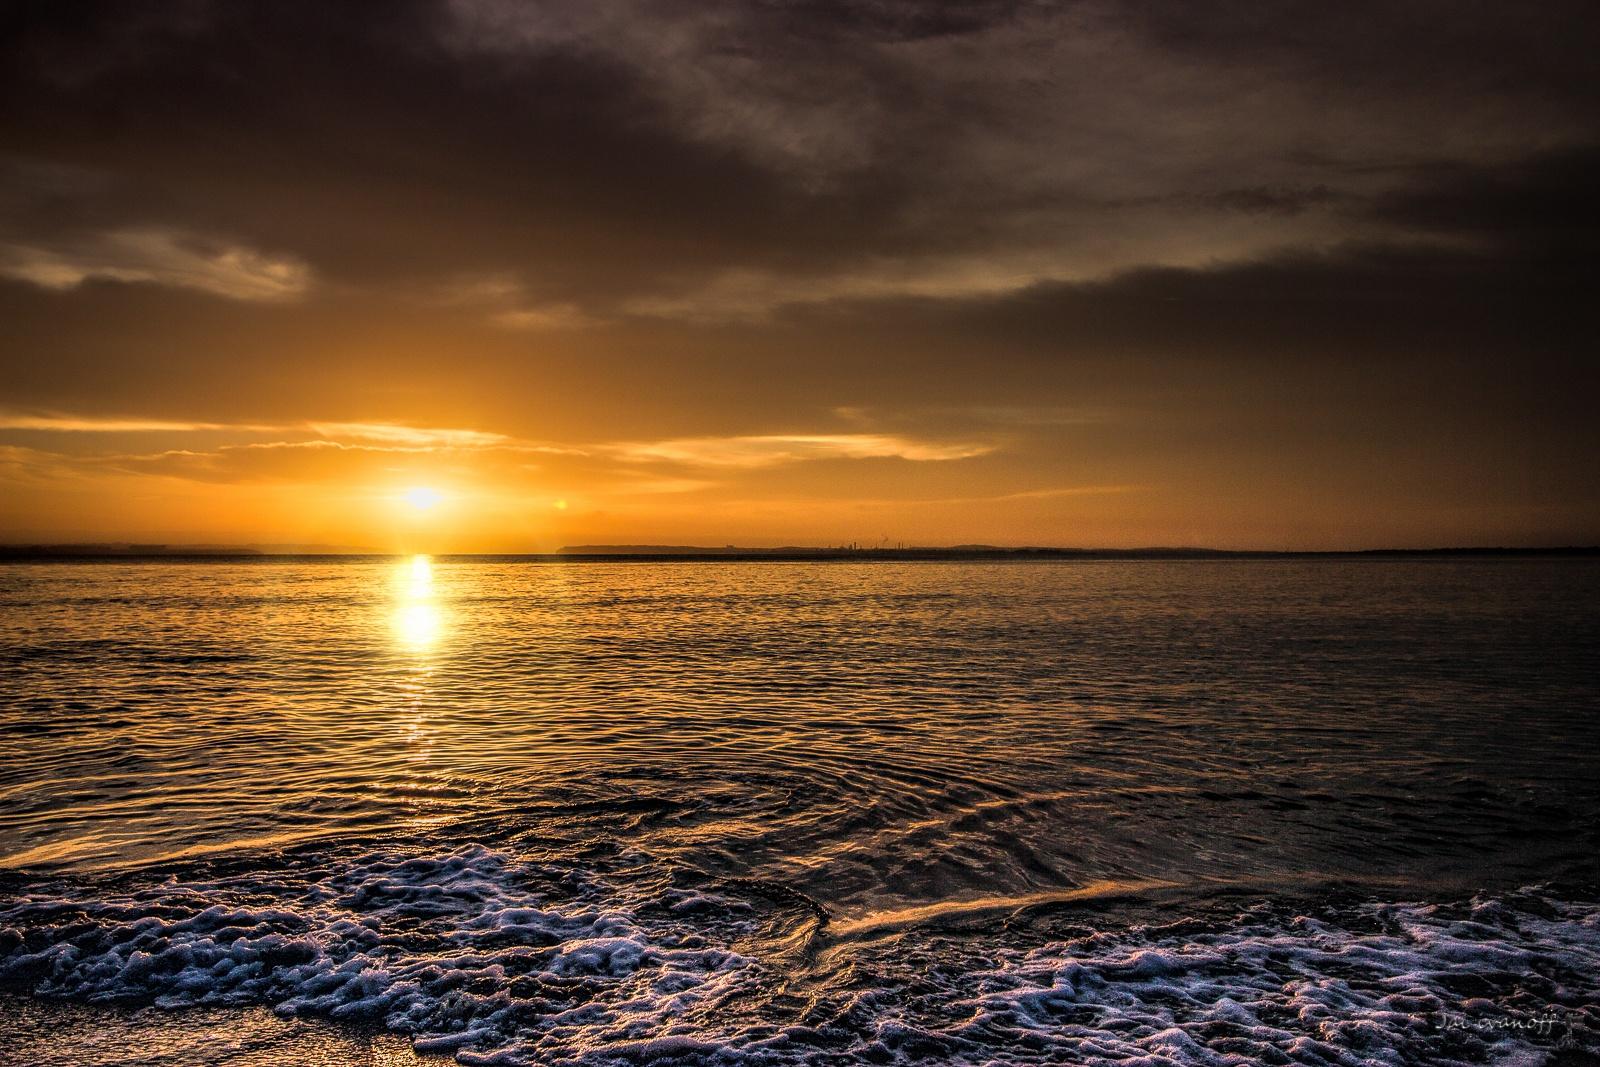 sunrise  by Jai Ivanoff